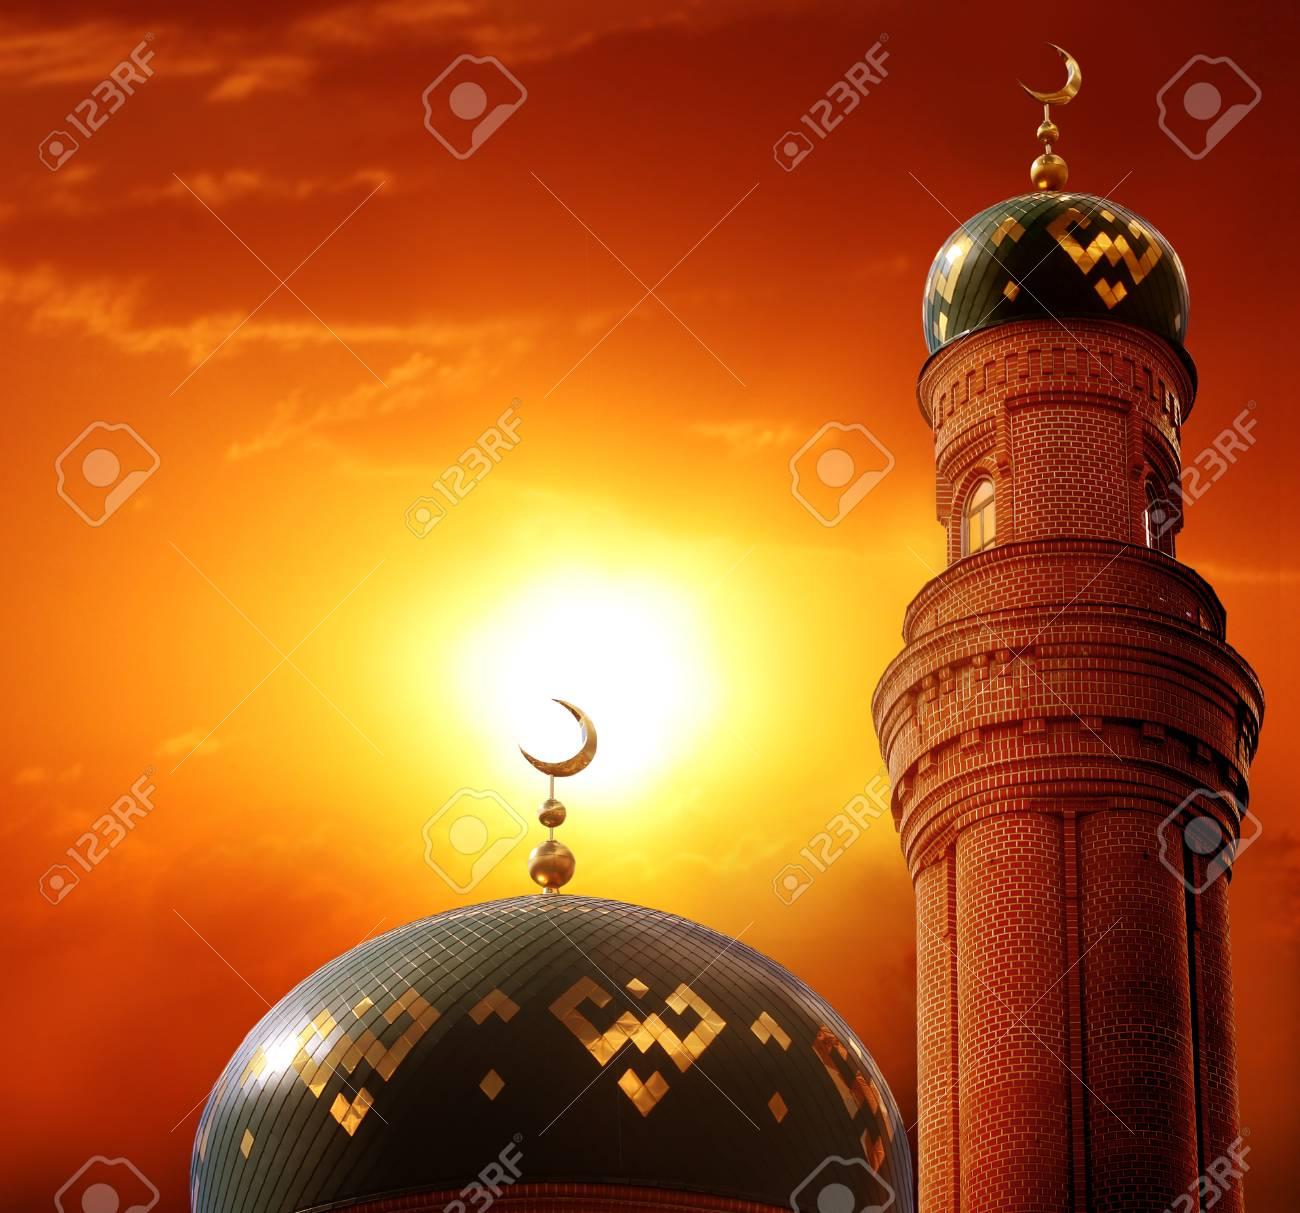 Ramadan kareem backgroundlamic greeting eid mubarak cards stock ramadan kareem backgroundlamic greeting eid mubarak cards for muslim holidayseid ul m4hsunfo